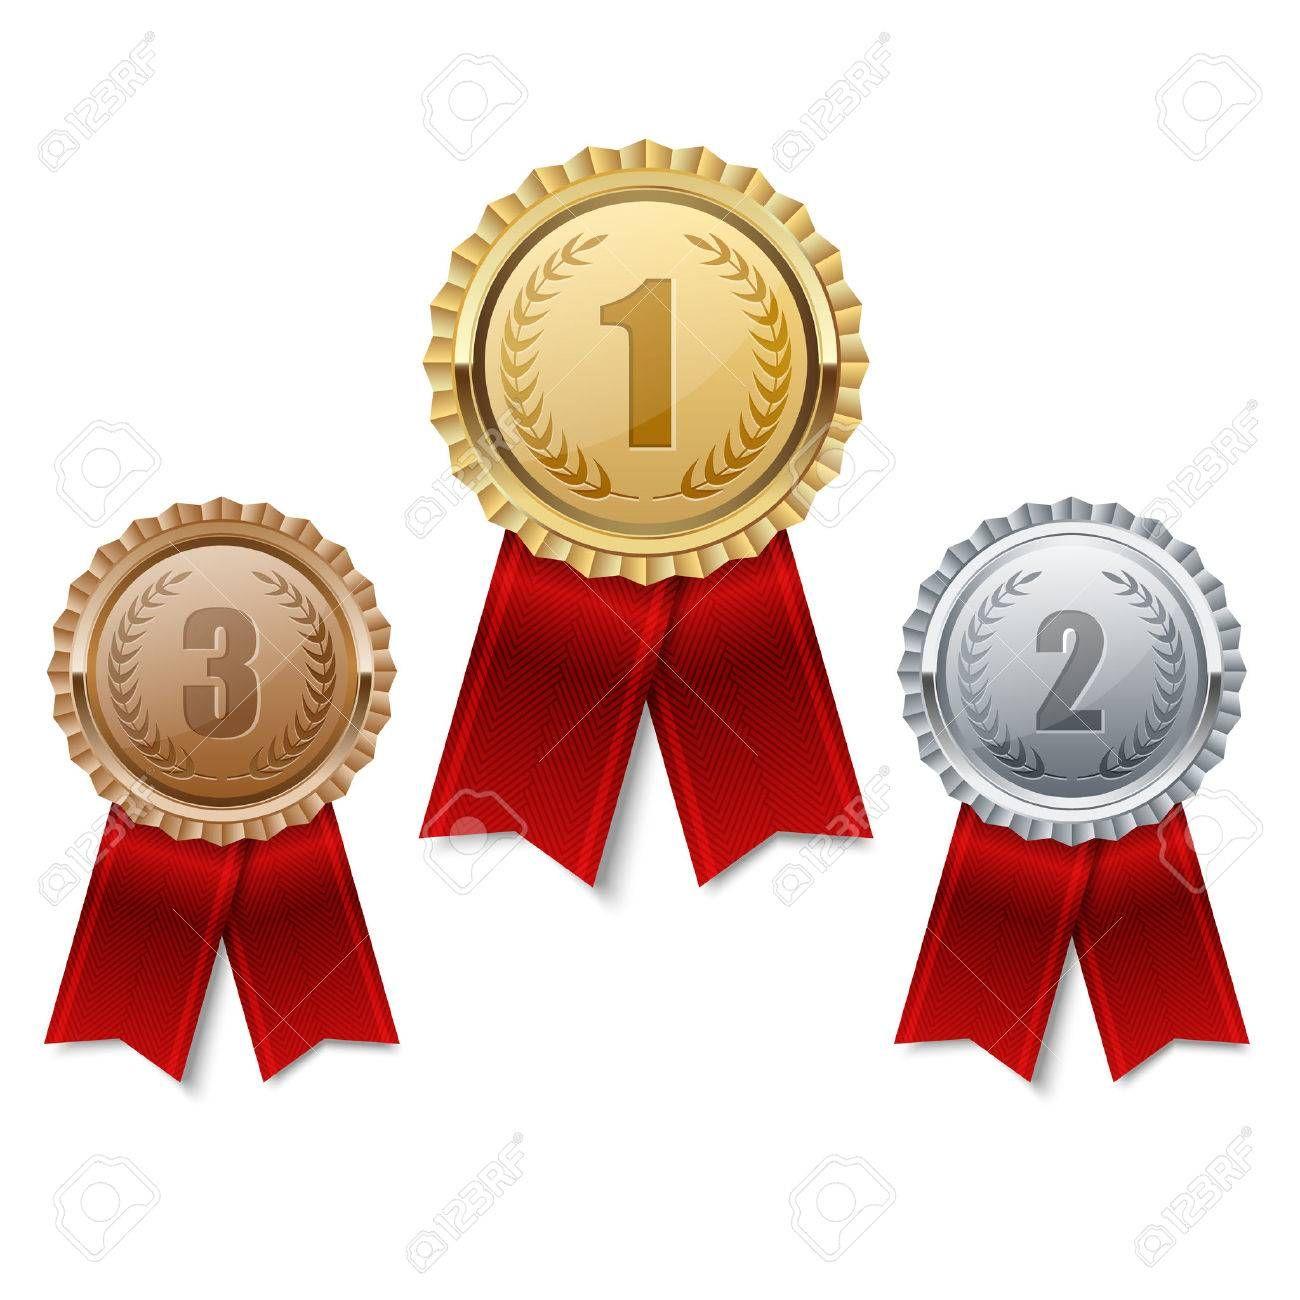 Set Of Gold Silver And Bronze Medals Aff Gold Set Silver Medals Bronze Certificate Design Template Digital Graphics Art Photoshop Design